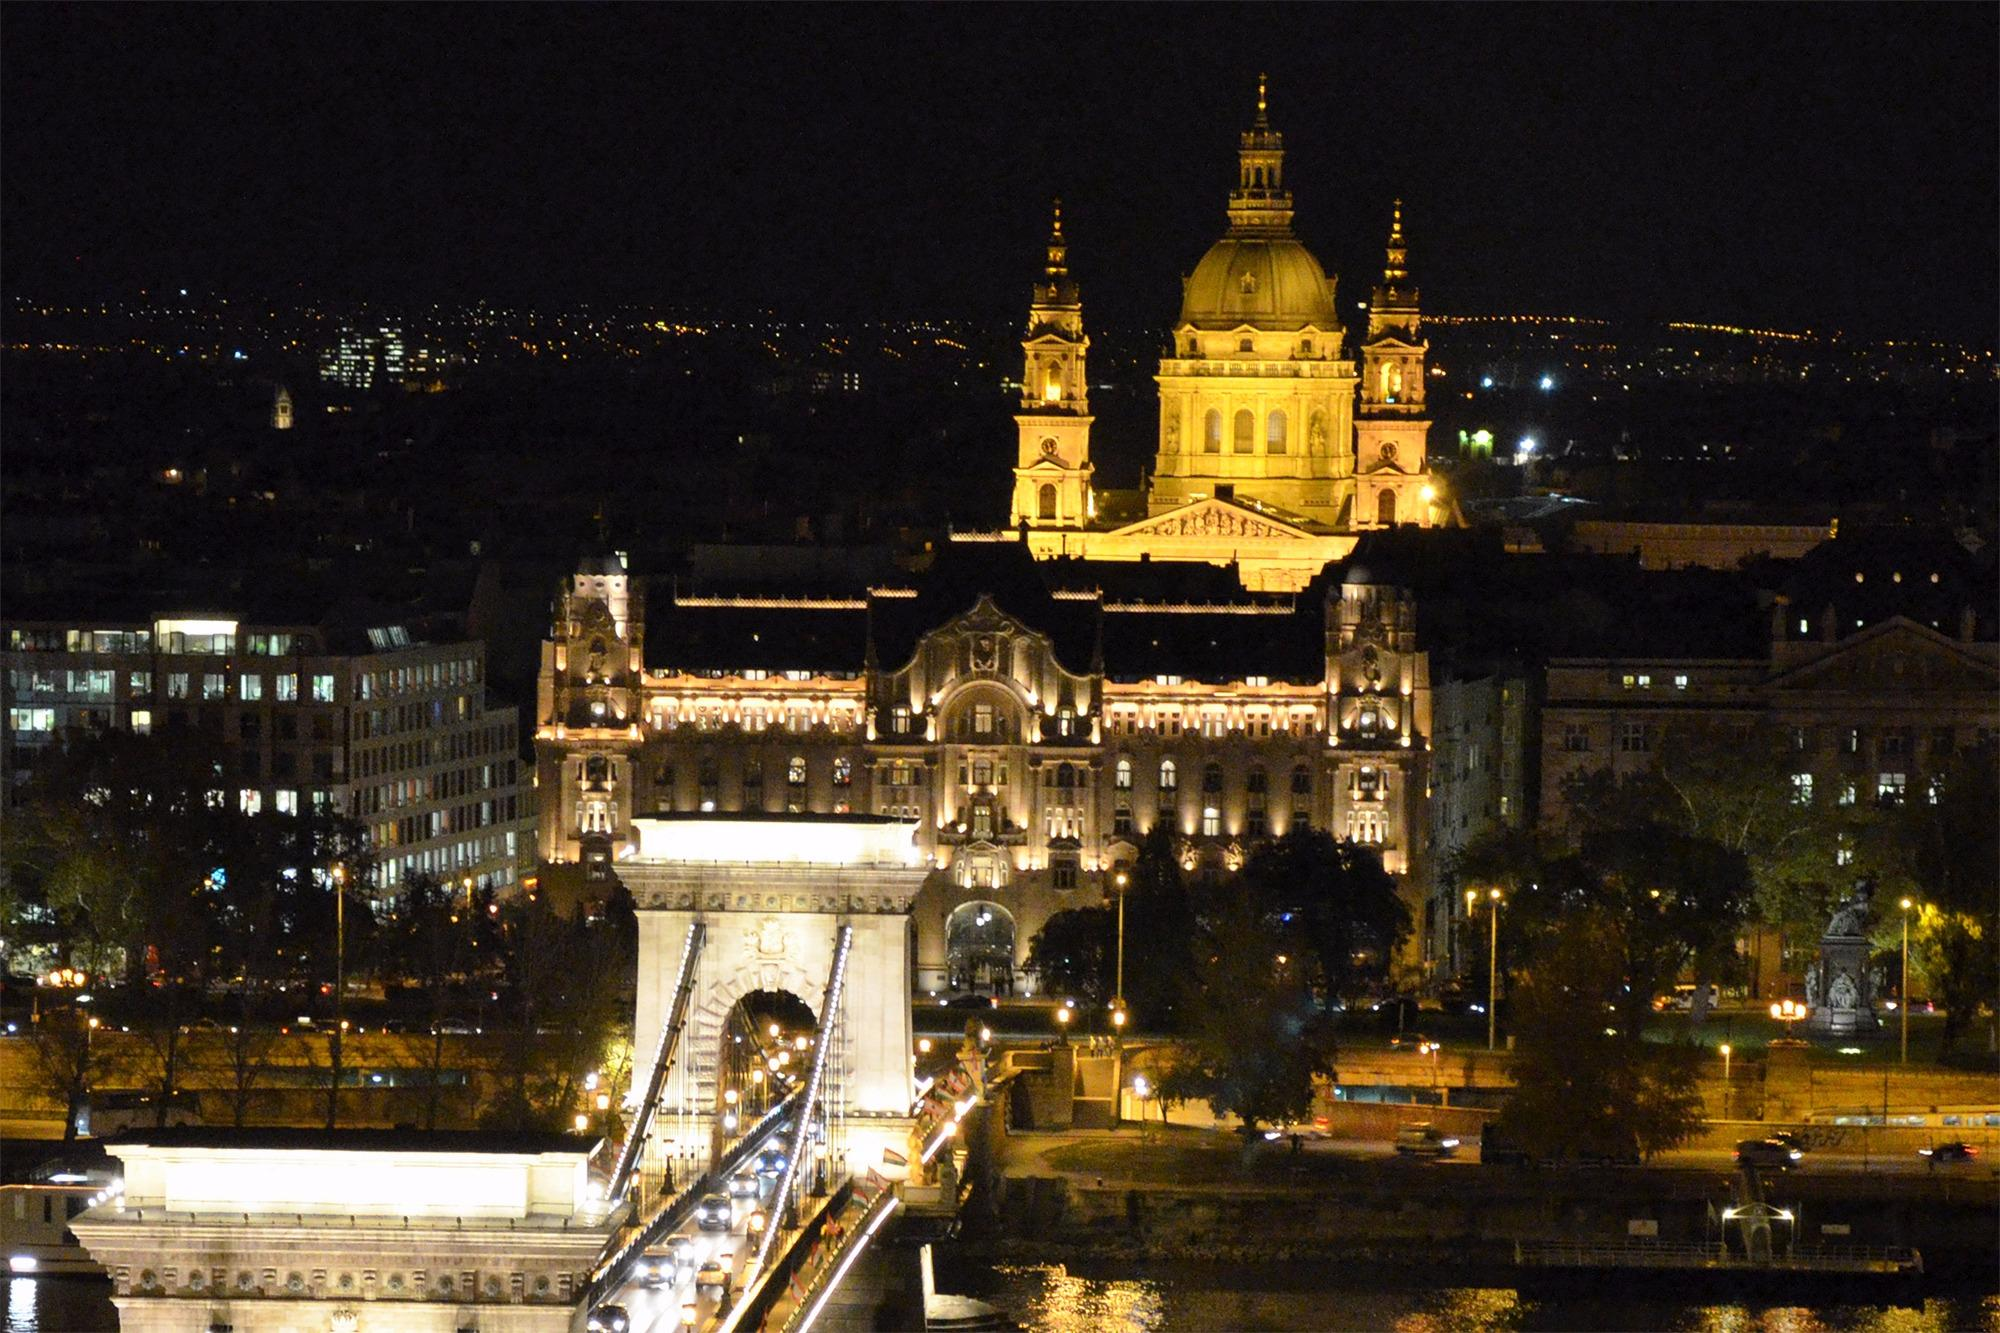 Базилика Святого Иштвана, Будапешт, Венгрия